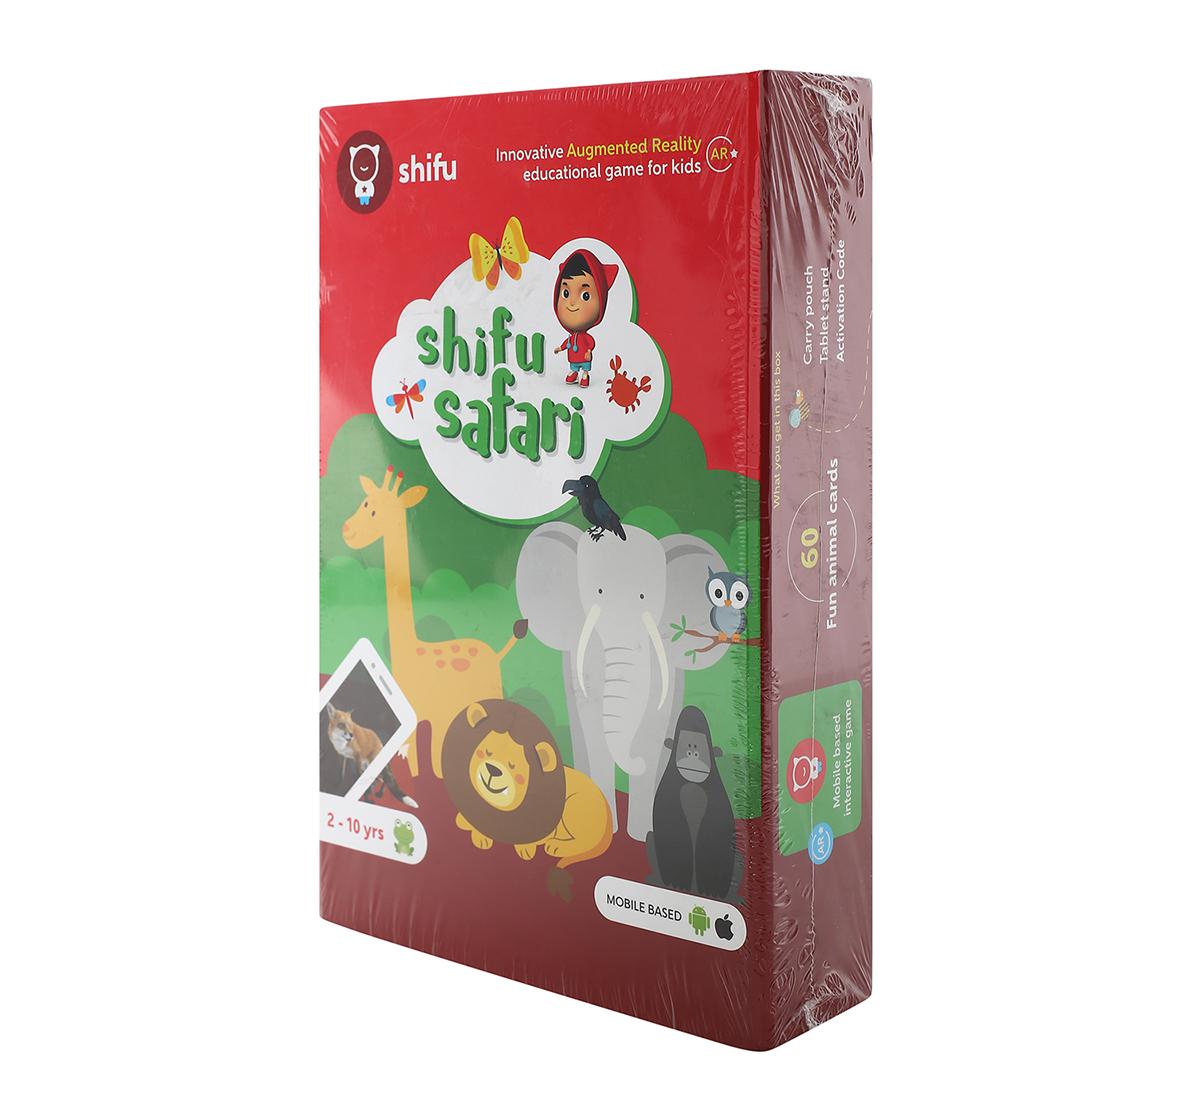 Playshifu | Playshifu Safari Augmented Reality Learning Games - Ios & Android (60 Animal Cards) Science Kits for Kids age 24M+